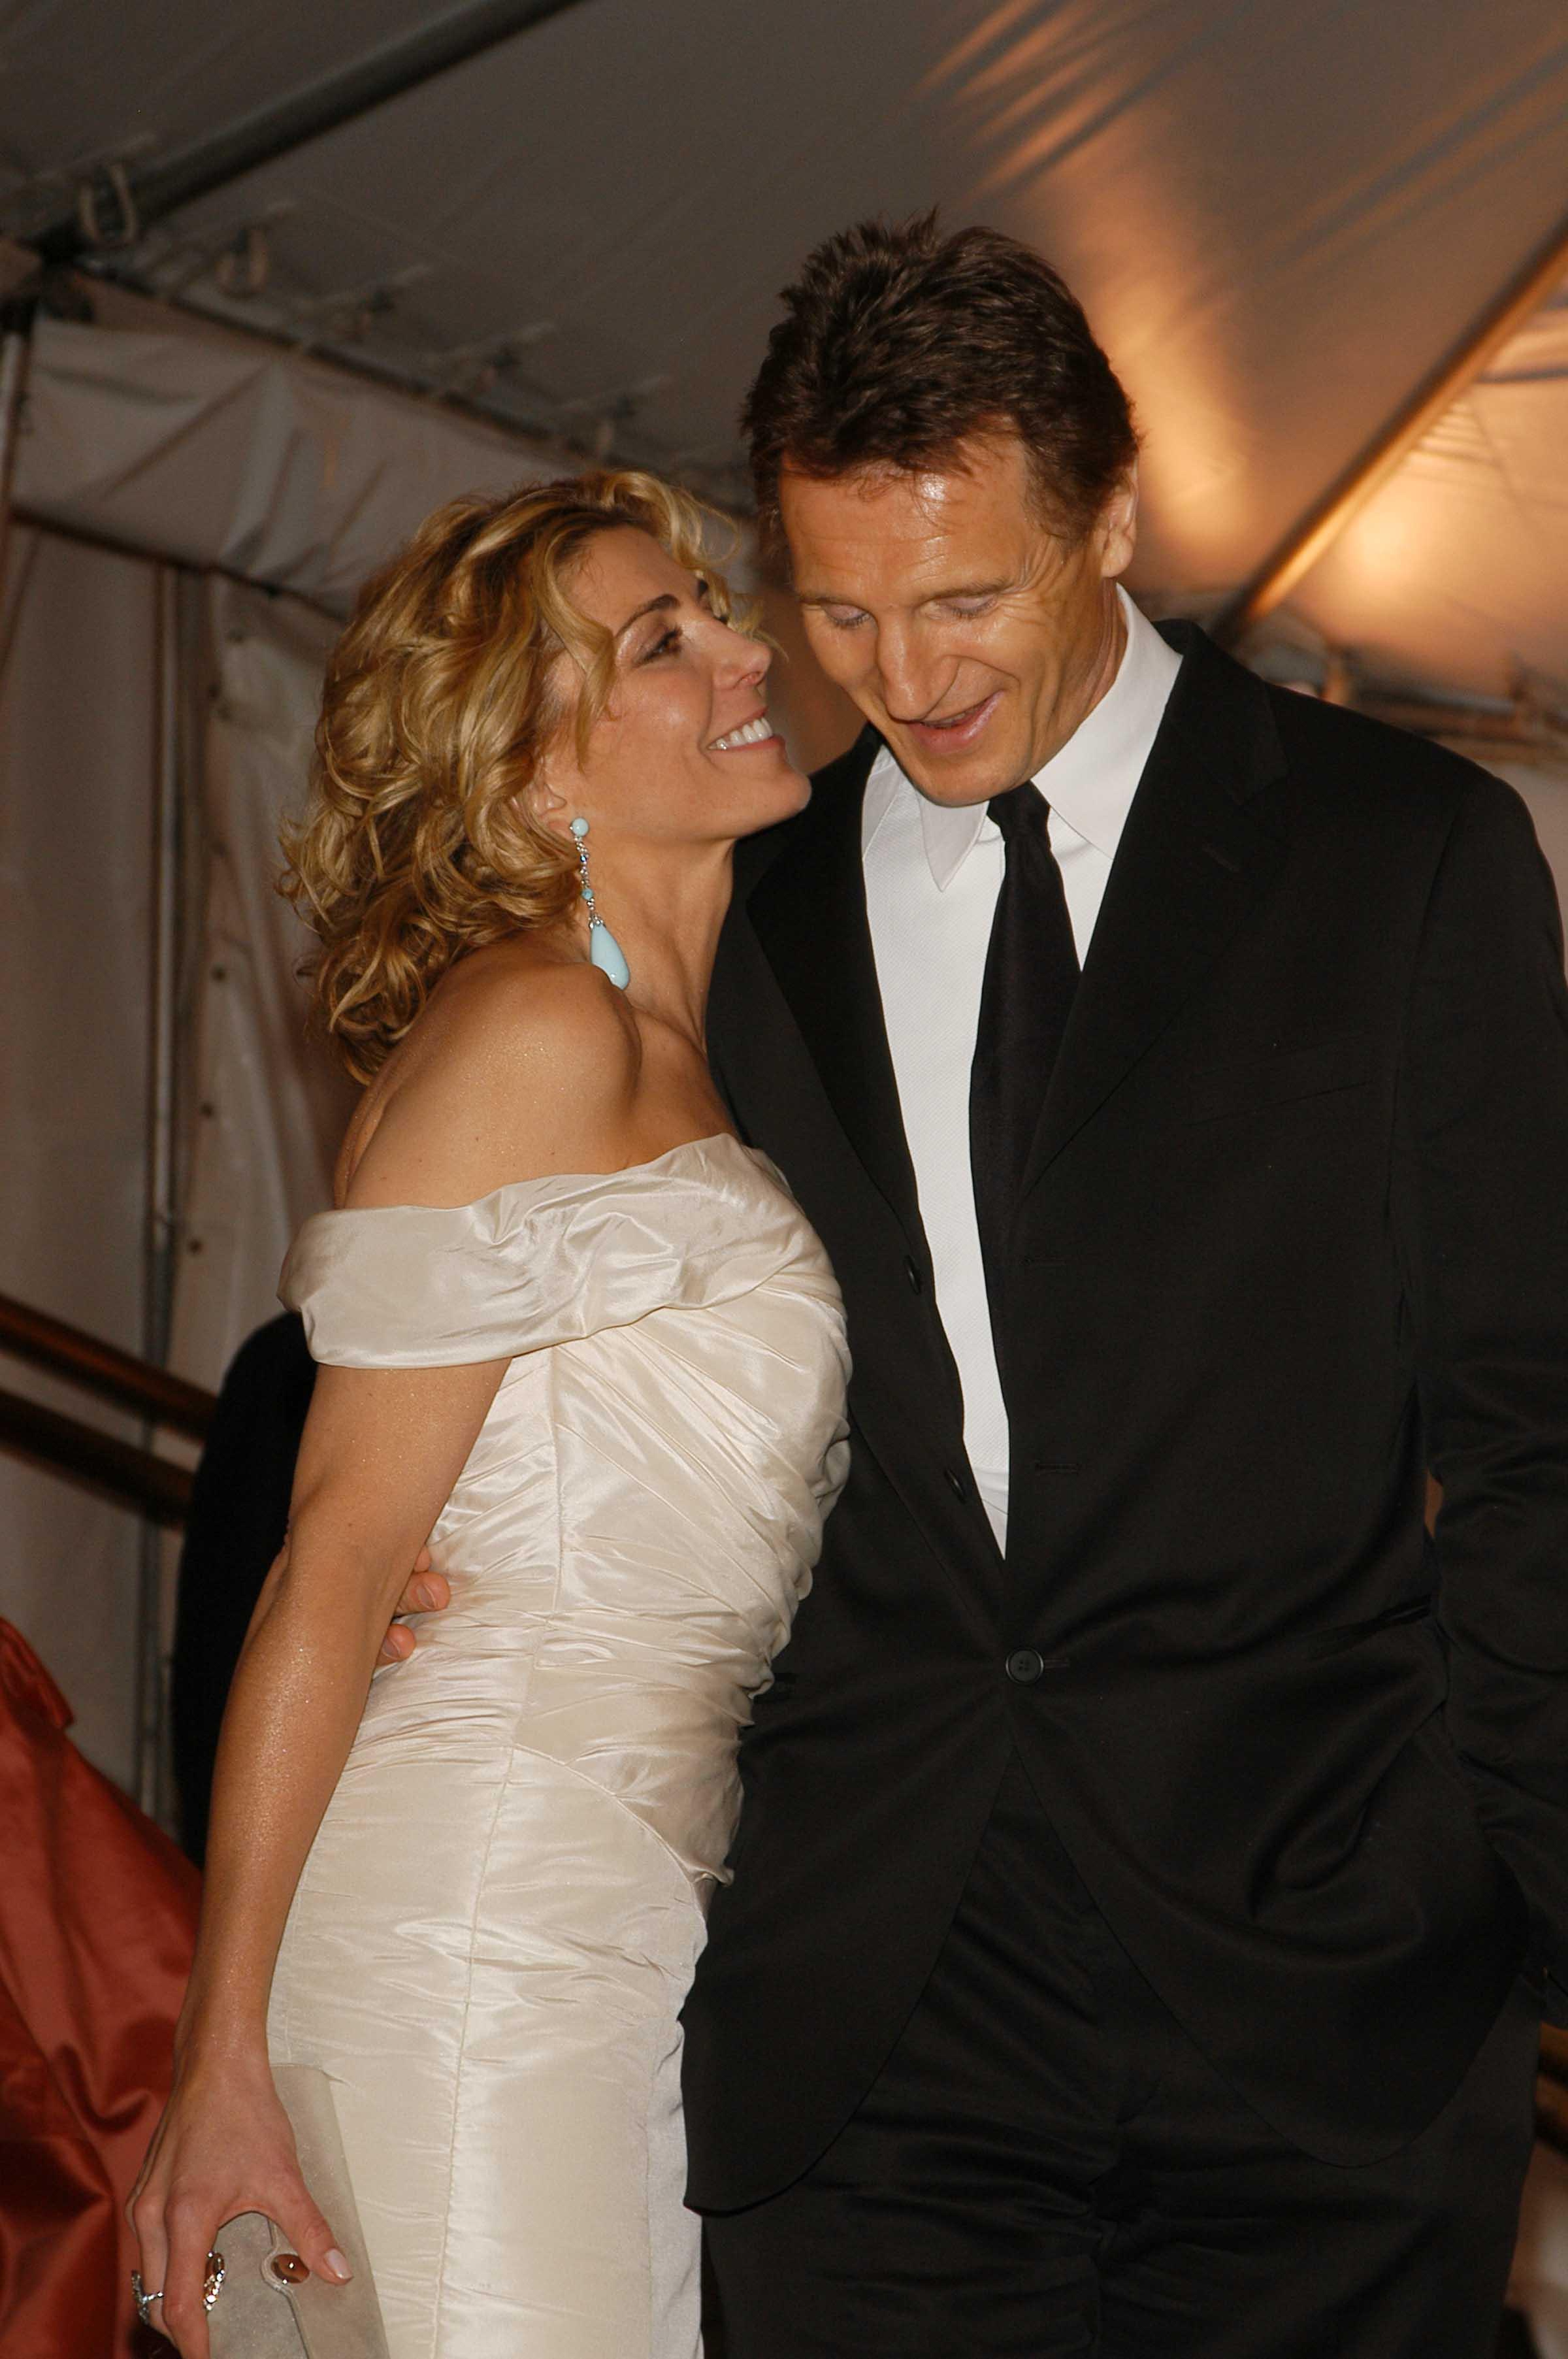 Wedding photos richardson natasha Liam Neeson